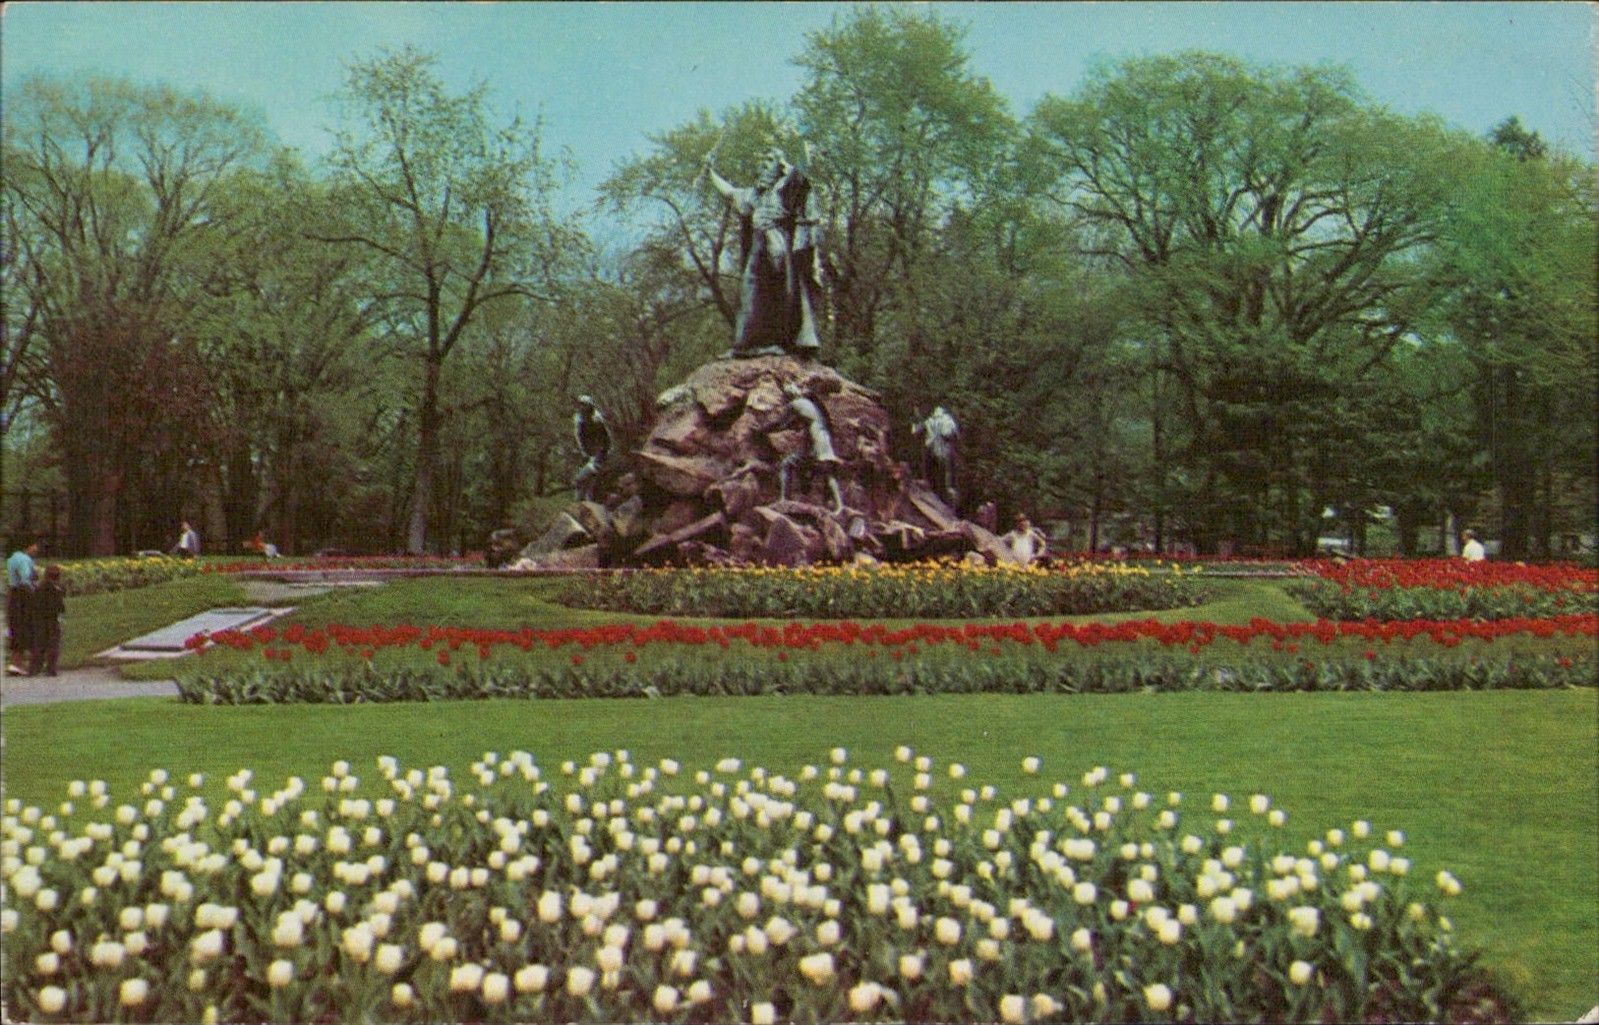 Tulip Festival in Washington Park Albany New York / HipPostcard